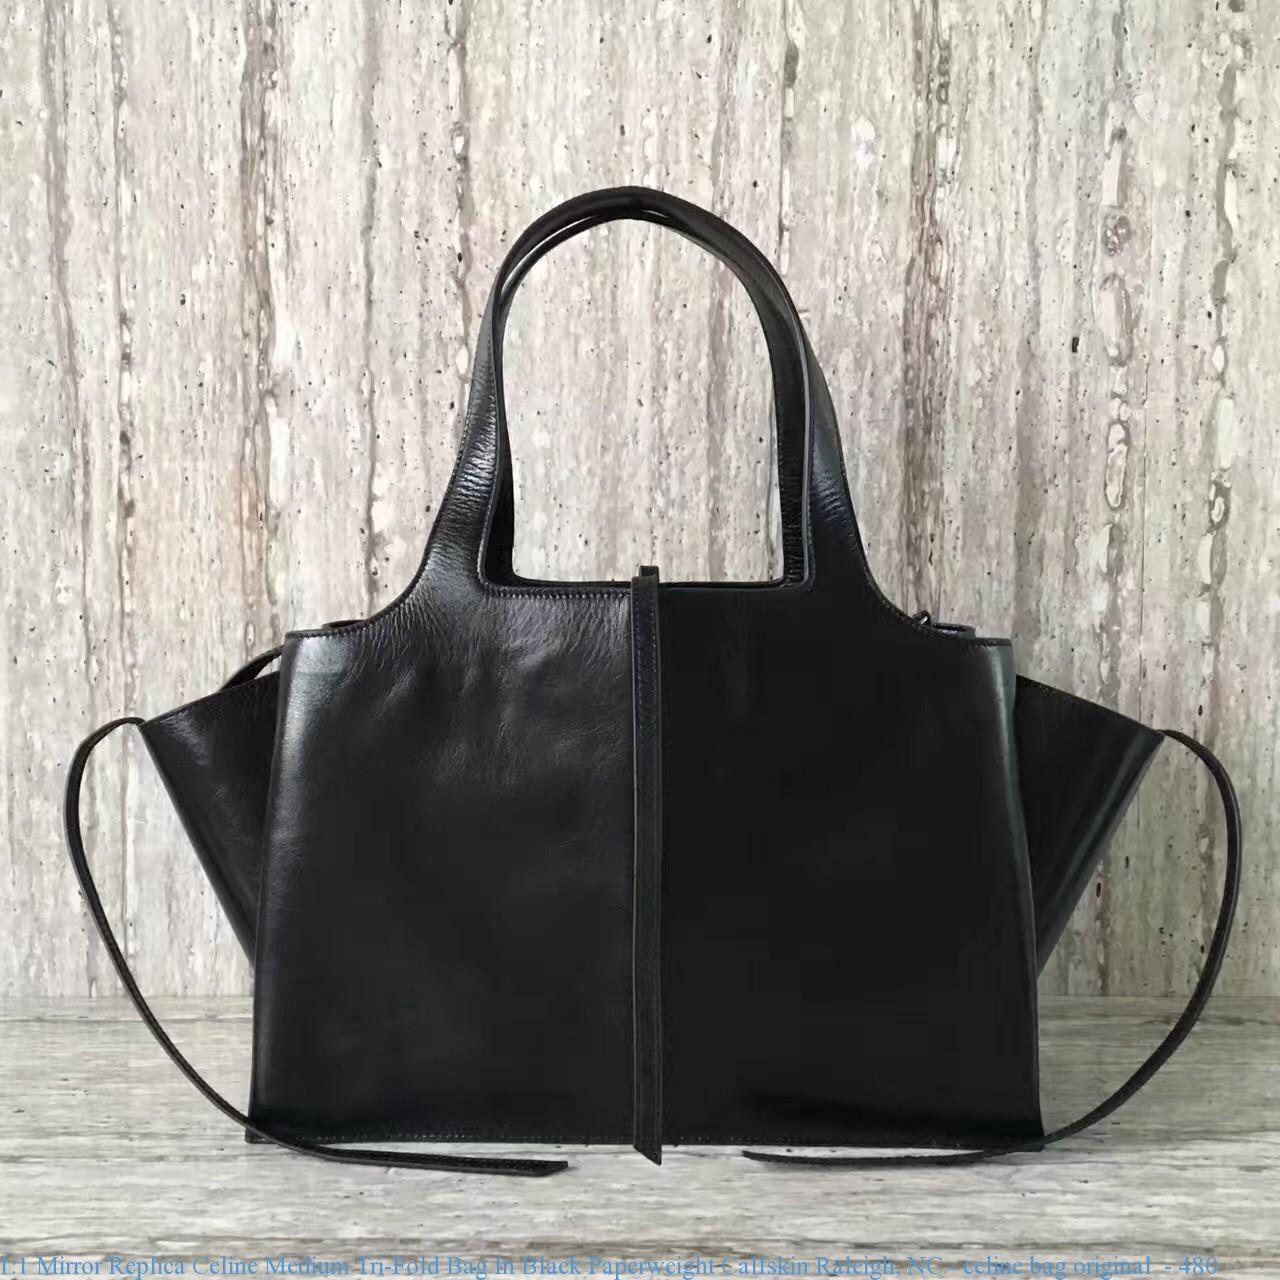 79018ee24b 1 1 Mirror Replica Celine Medium Tri-Fold Bag In Black Paperweight ...